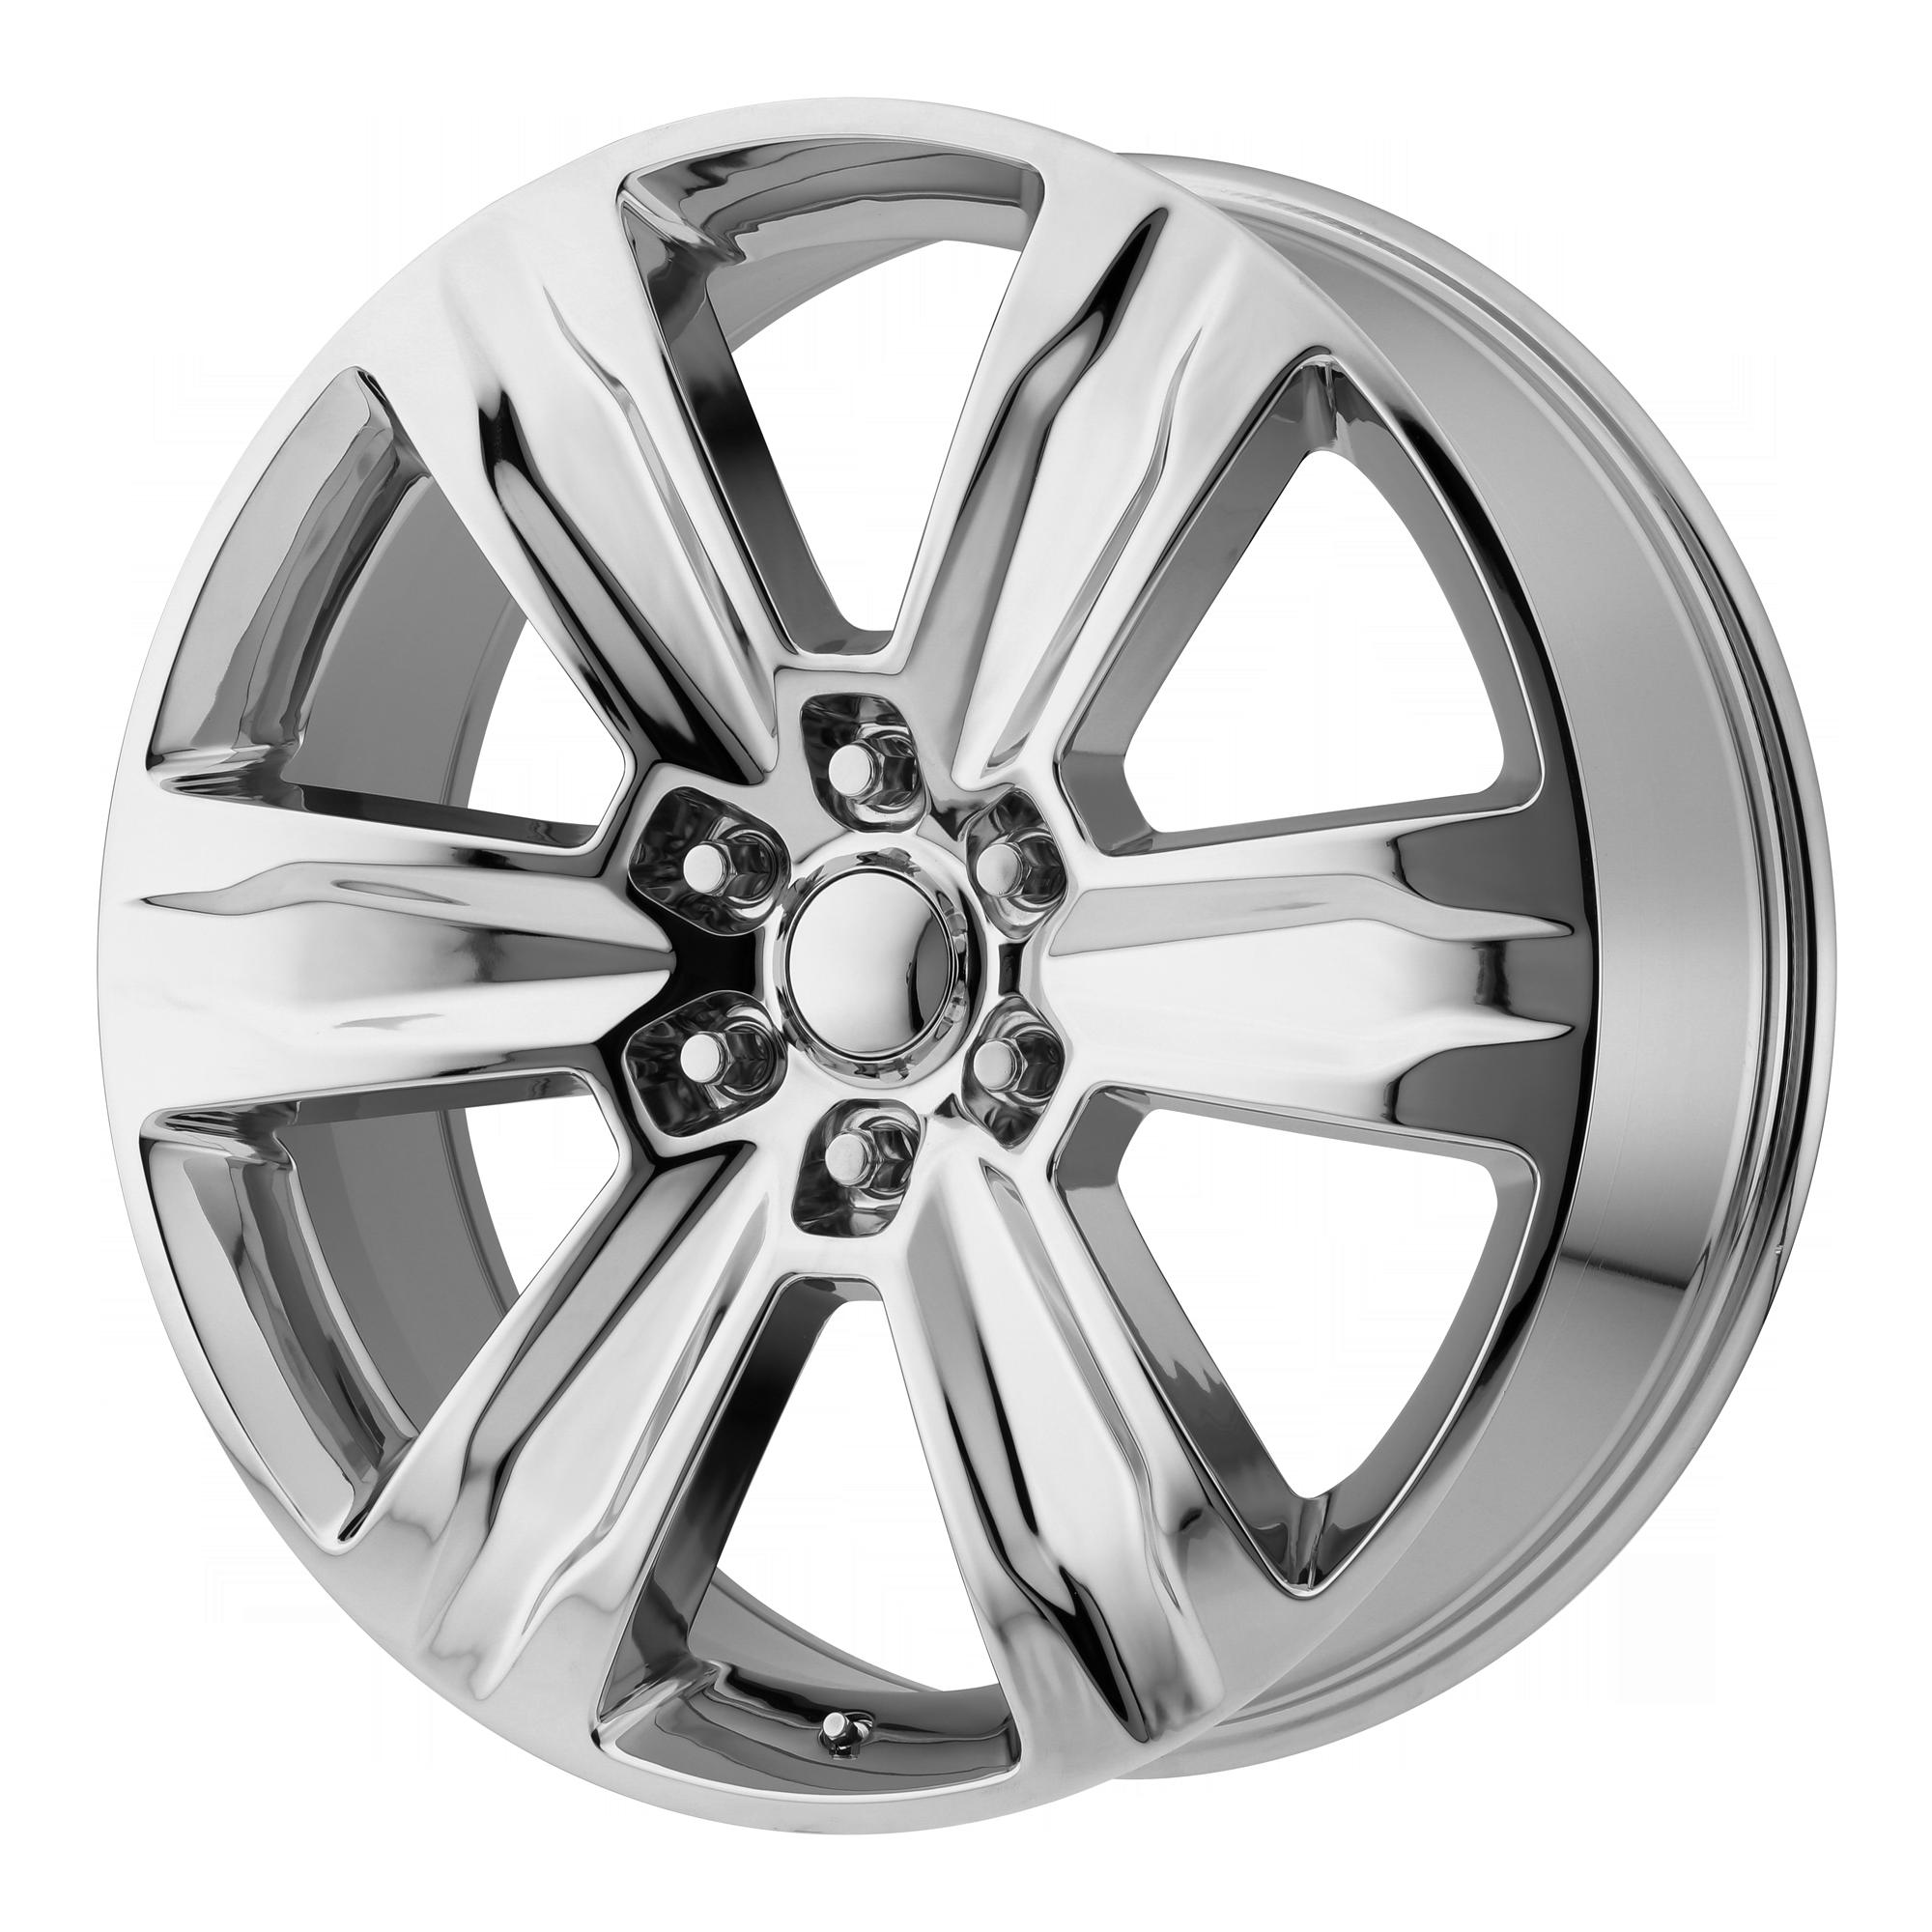 OE Creations Replica Wheels OE Creations PR172 Chrome